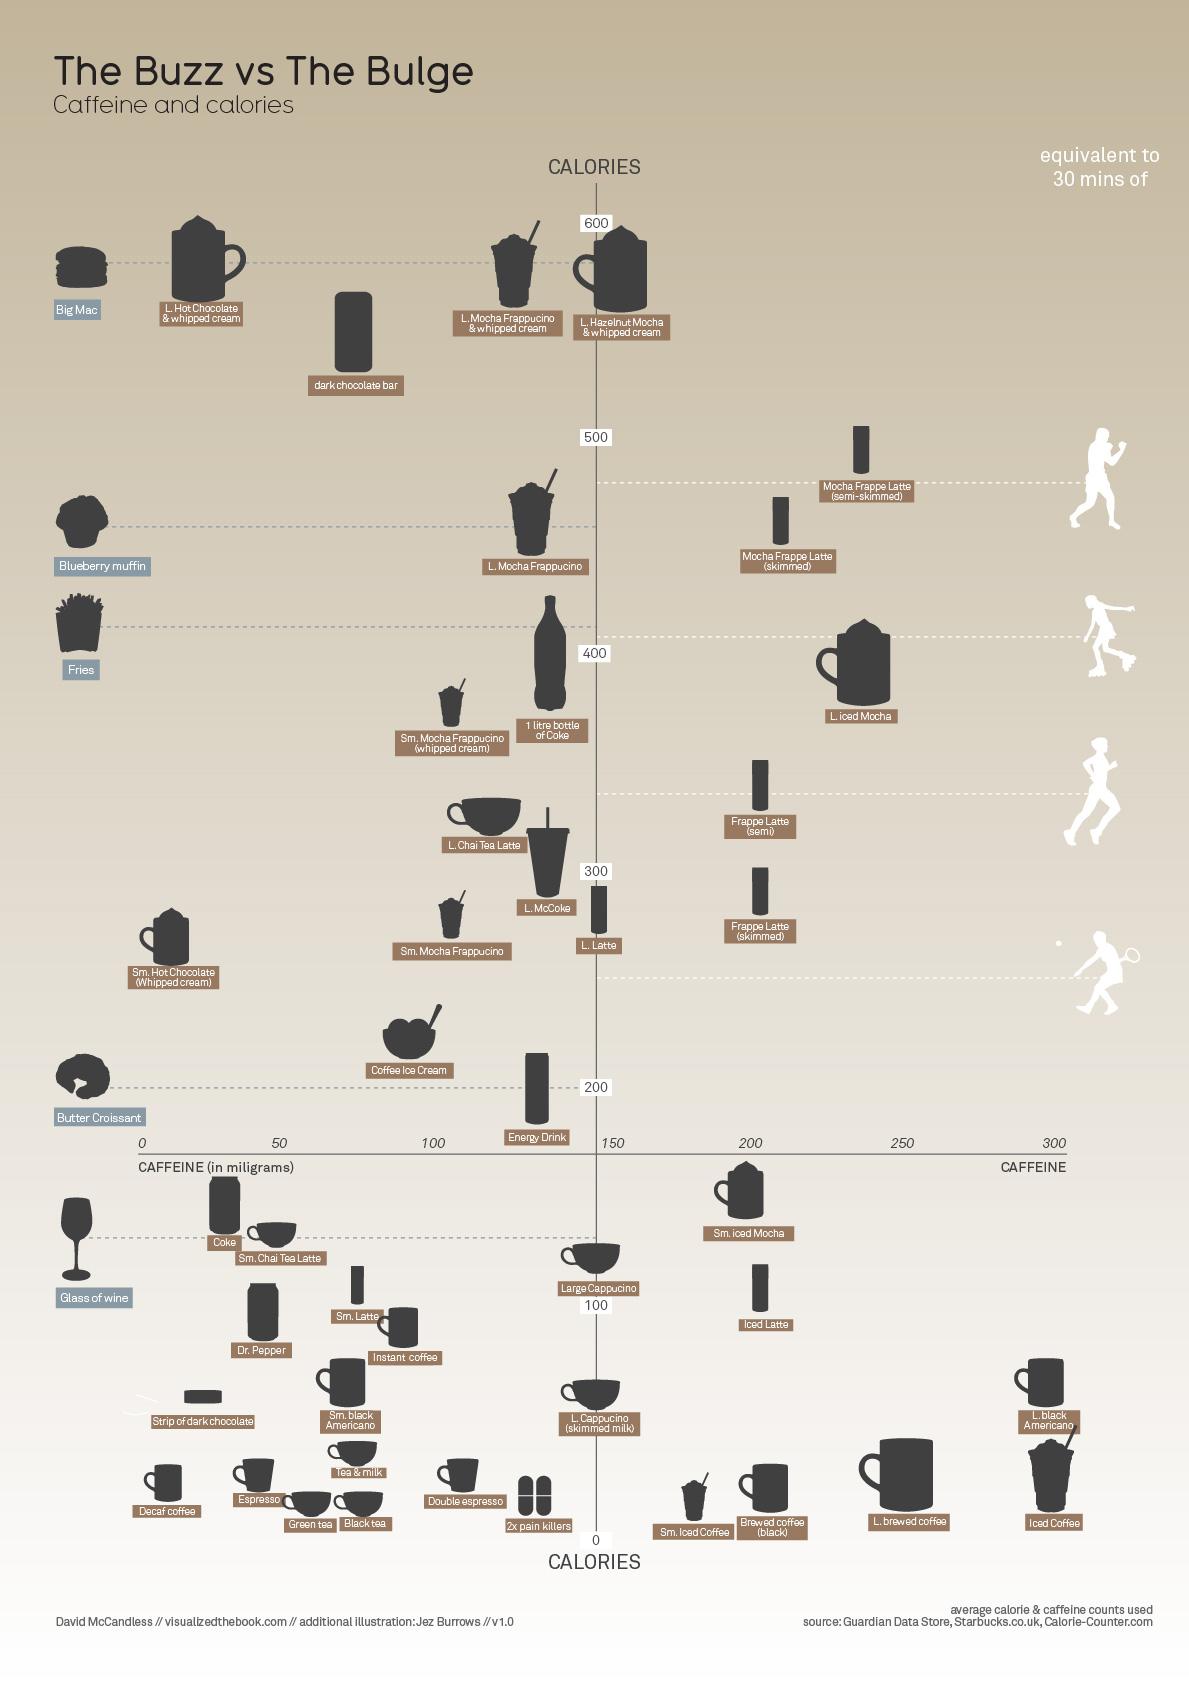 Caffeine vs Calories Infographic